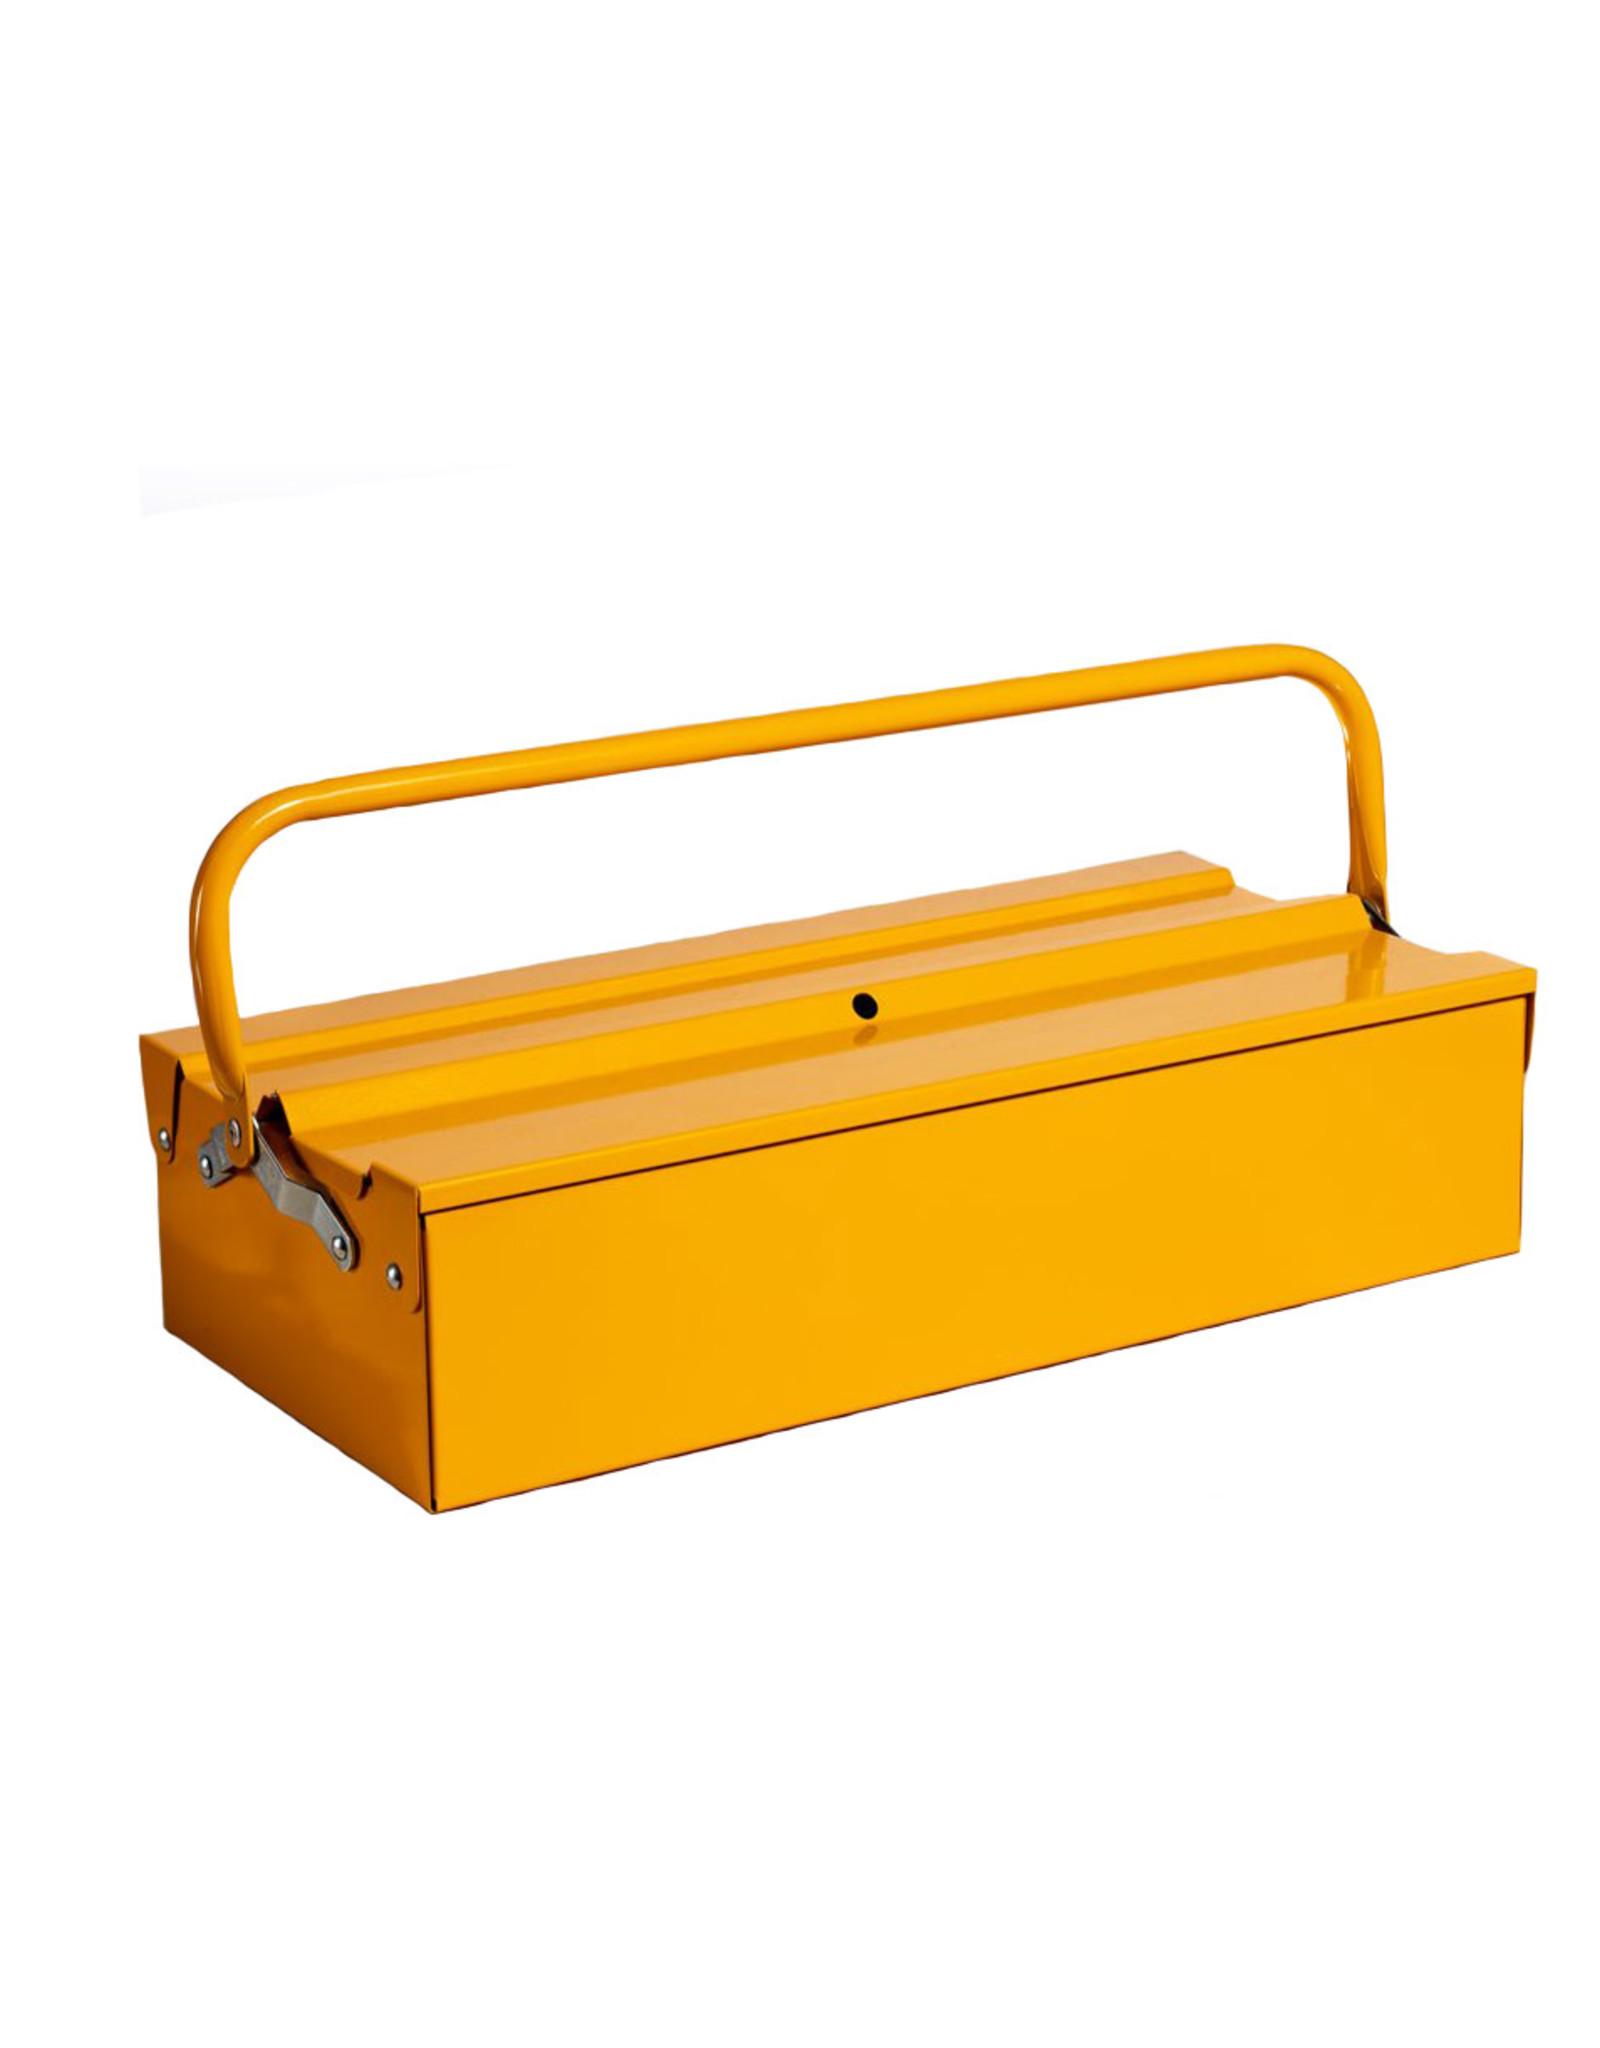 Single Layer Tool Box - Yellow